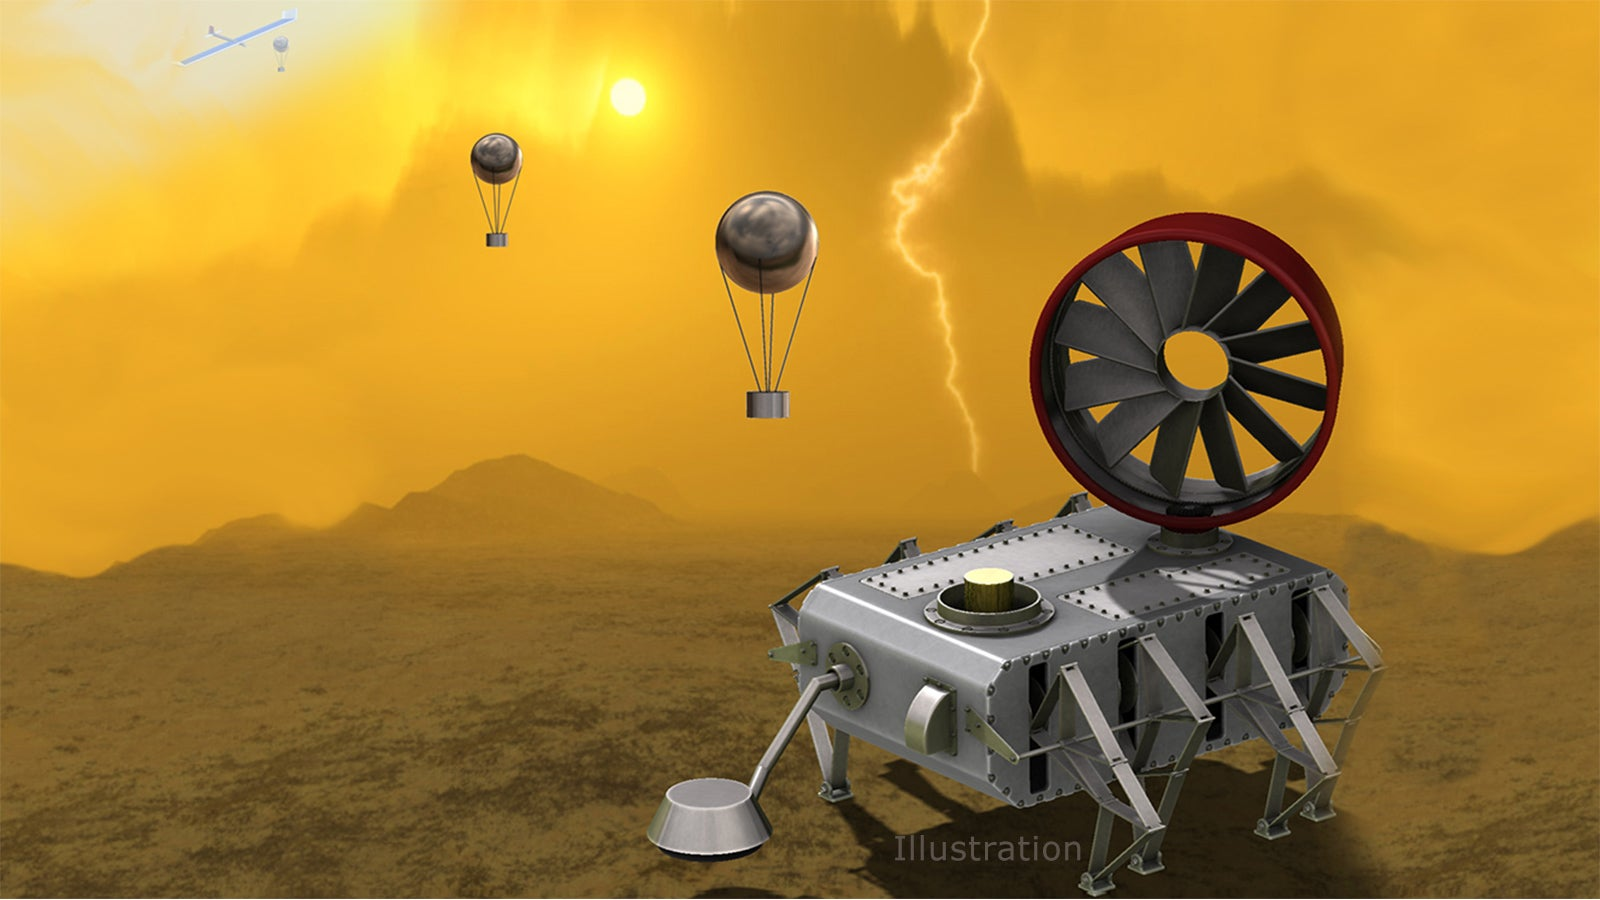 NASA's Latest Venus Probe Concept Looks Like A Tim Burton Creation